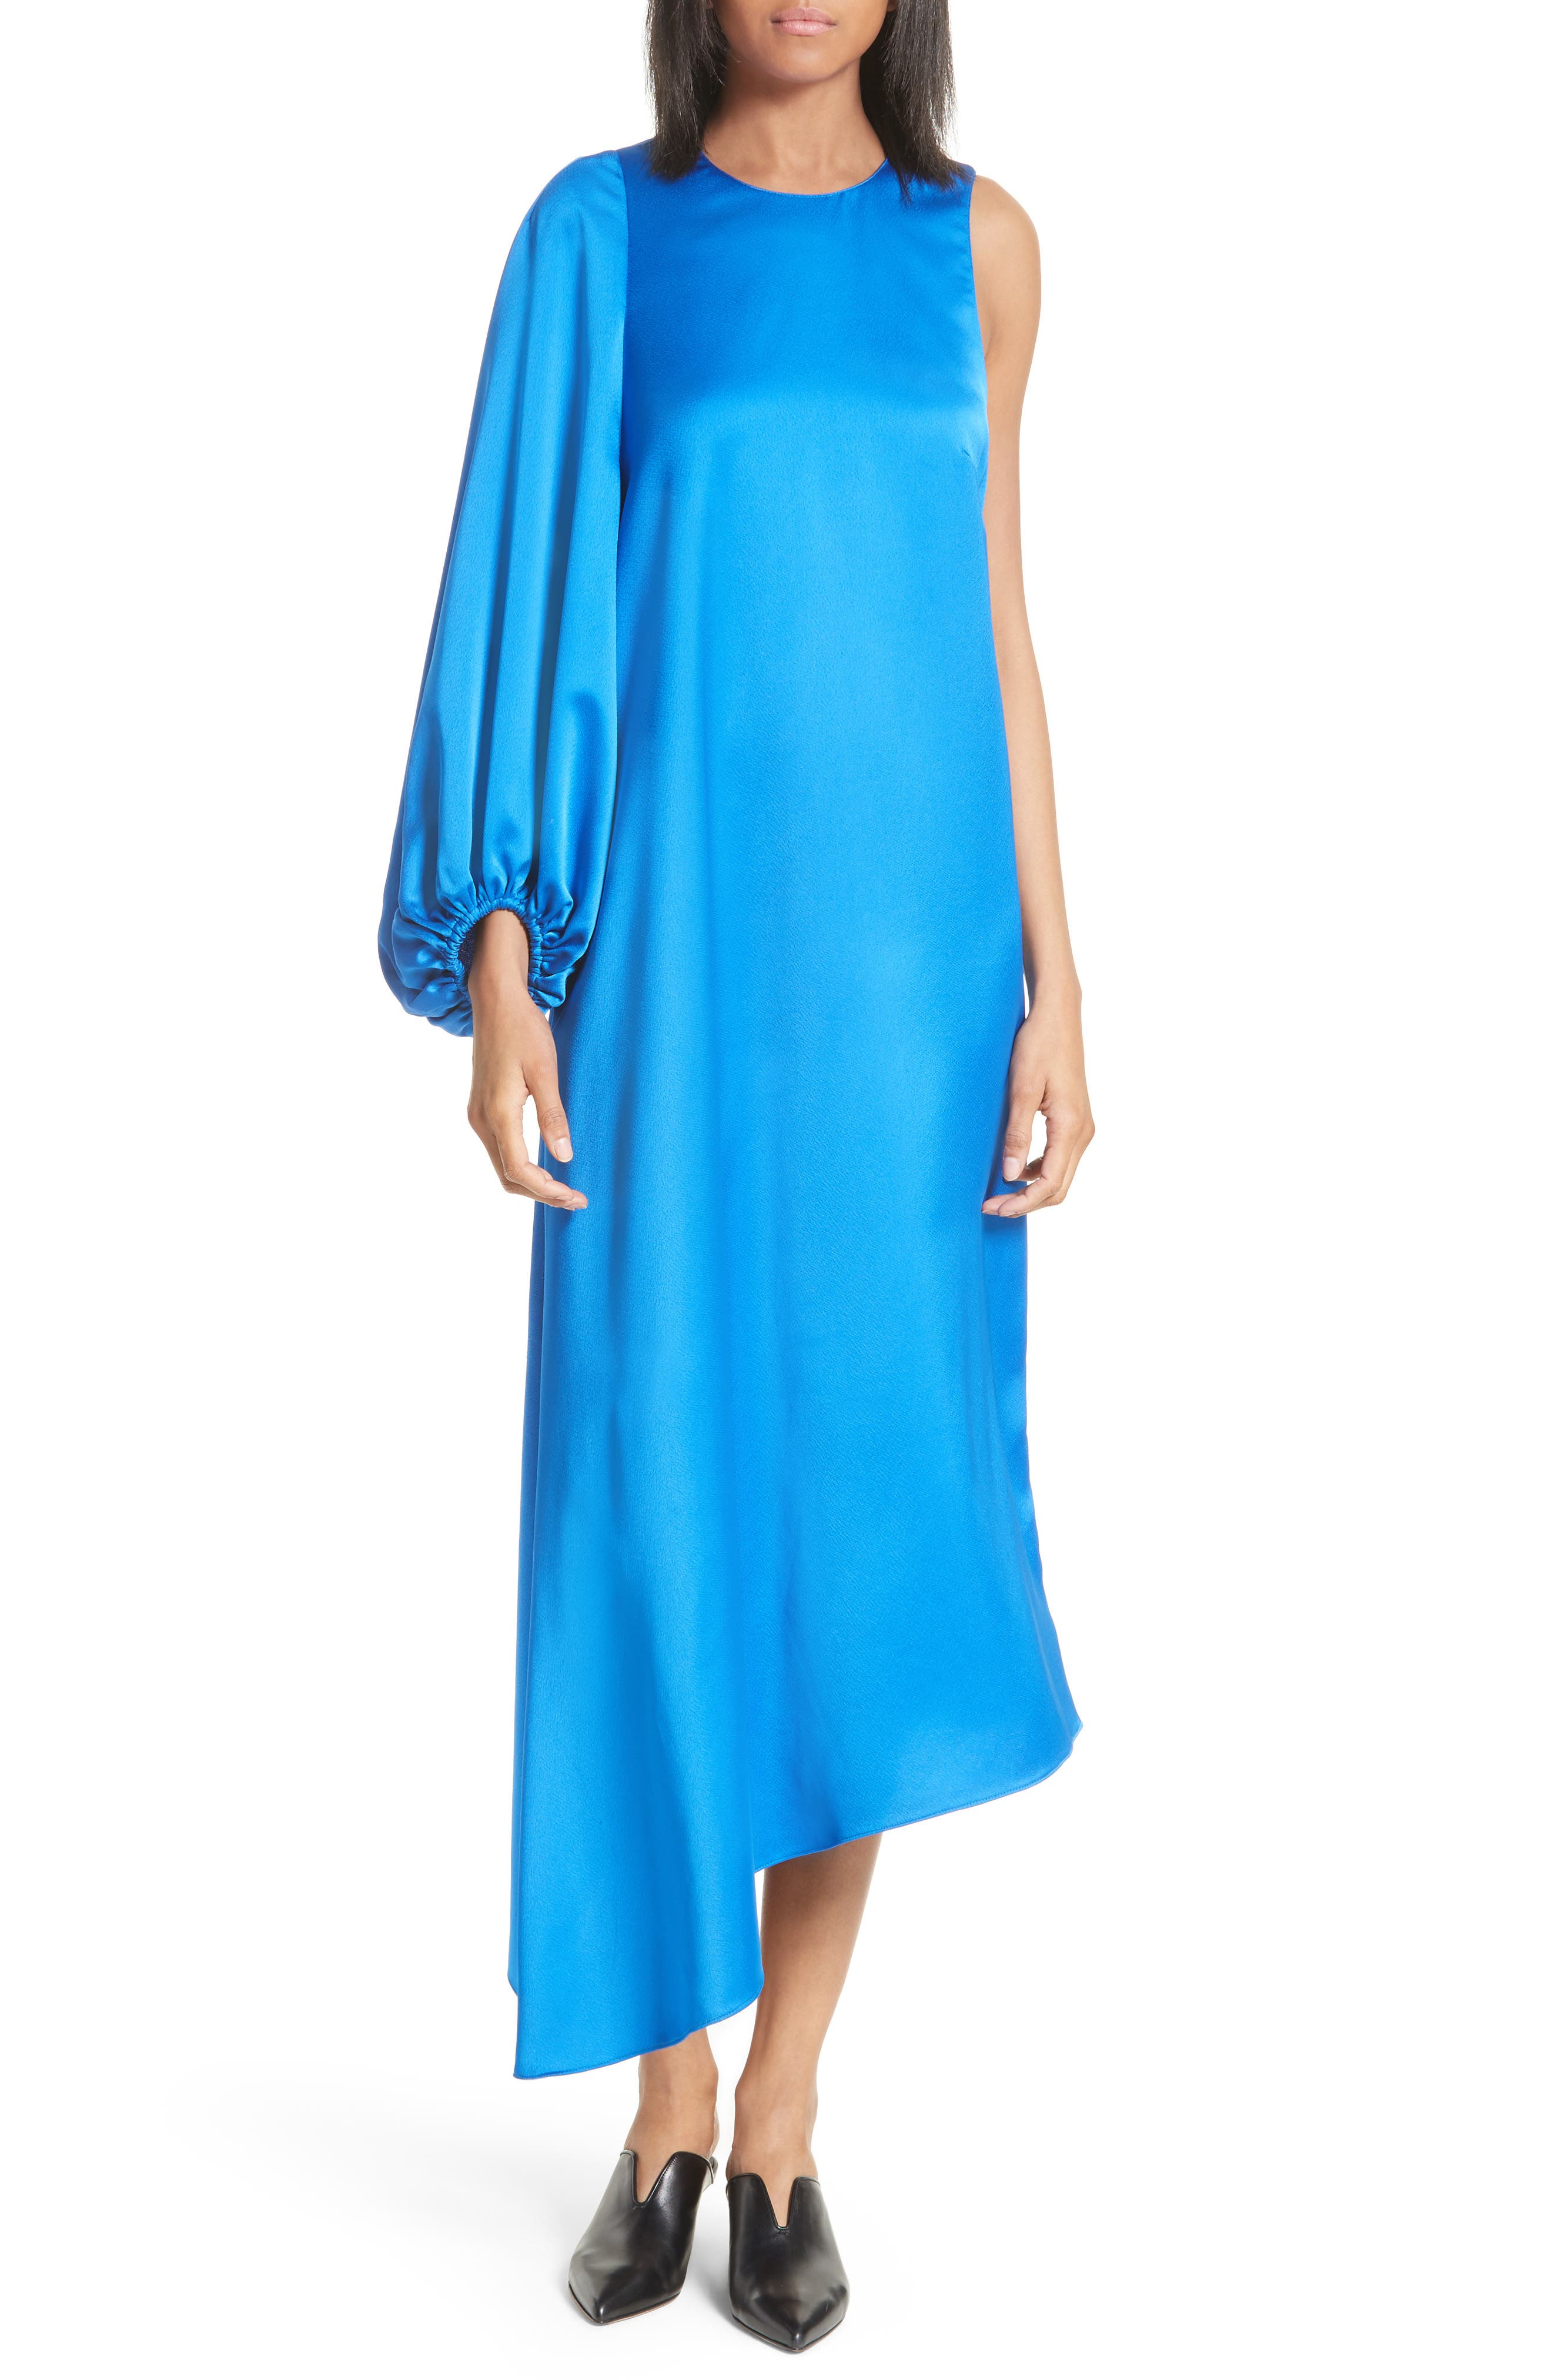 Celestia One Sleeve Bias Cut Satin Dress,                             Main thumbnail 1, color,                             408